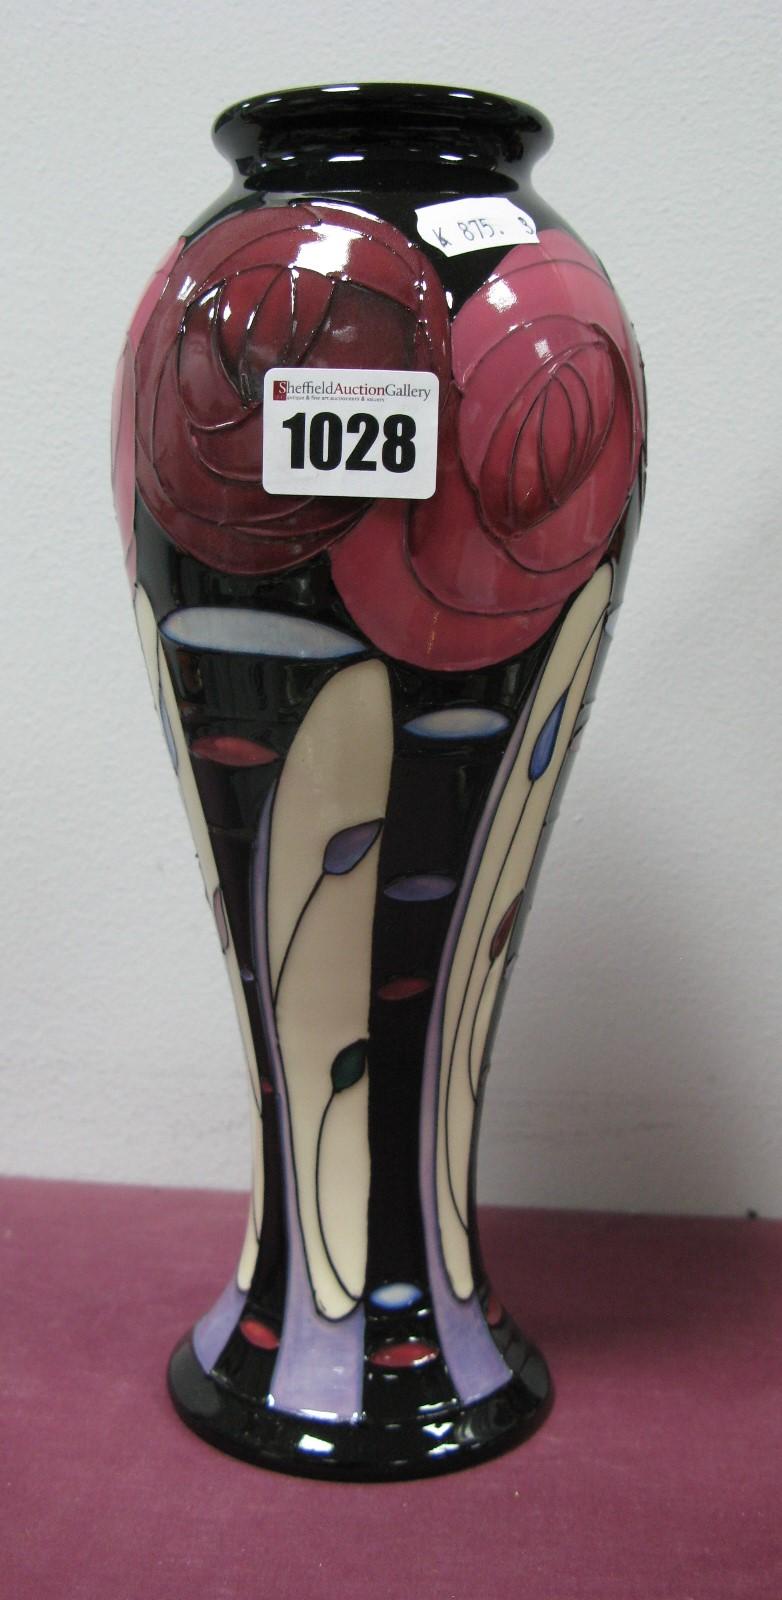 Lot 1028 - A Moorcroft First Quality 'Bellahouston' Vase, shape 75/10, 27cm high.